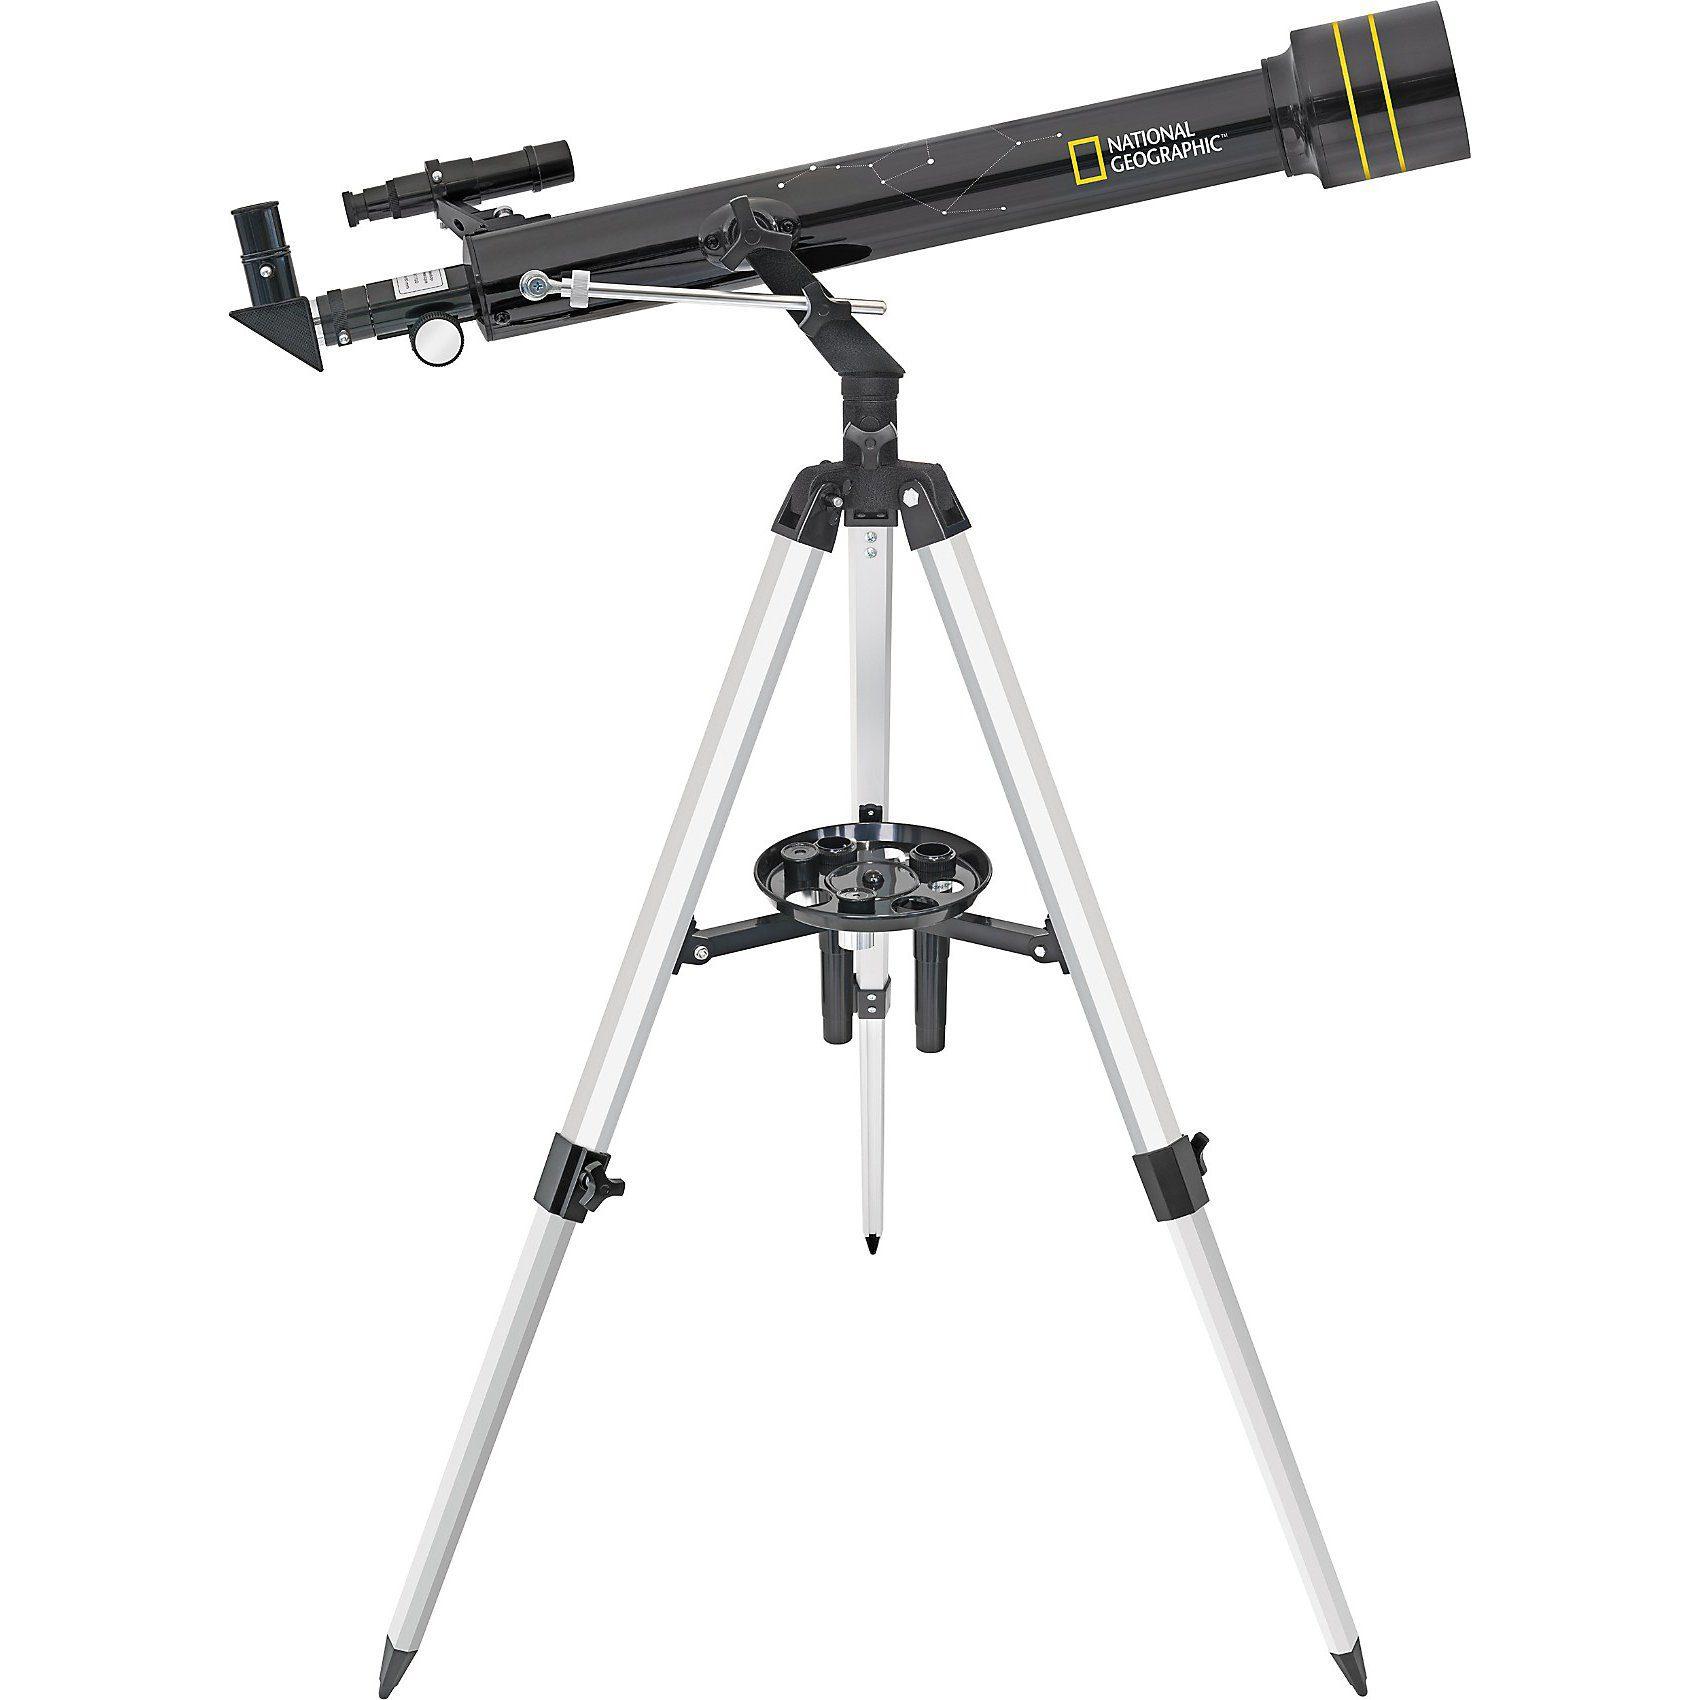 Bresser National Geographic 60/700 Refraktor Teleskop